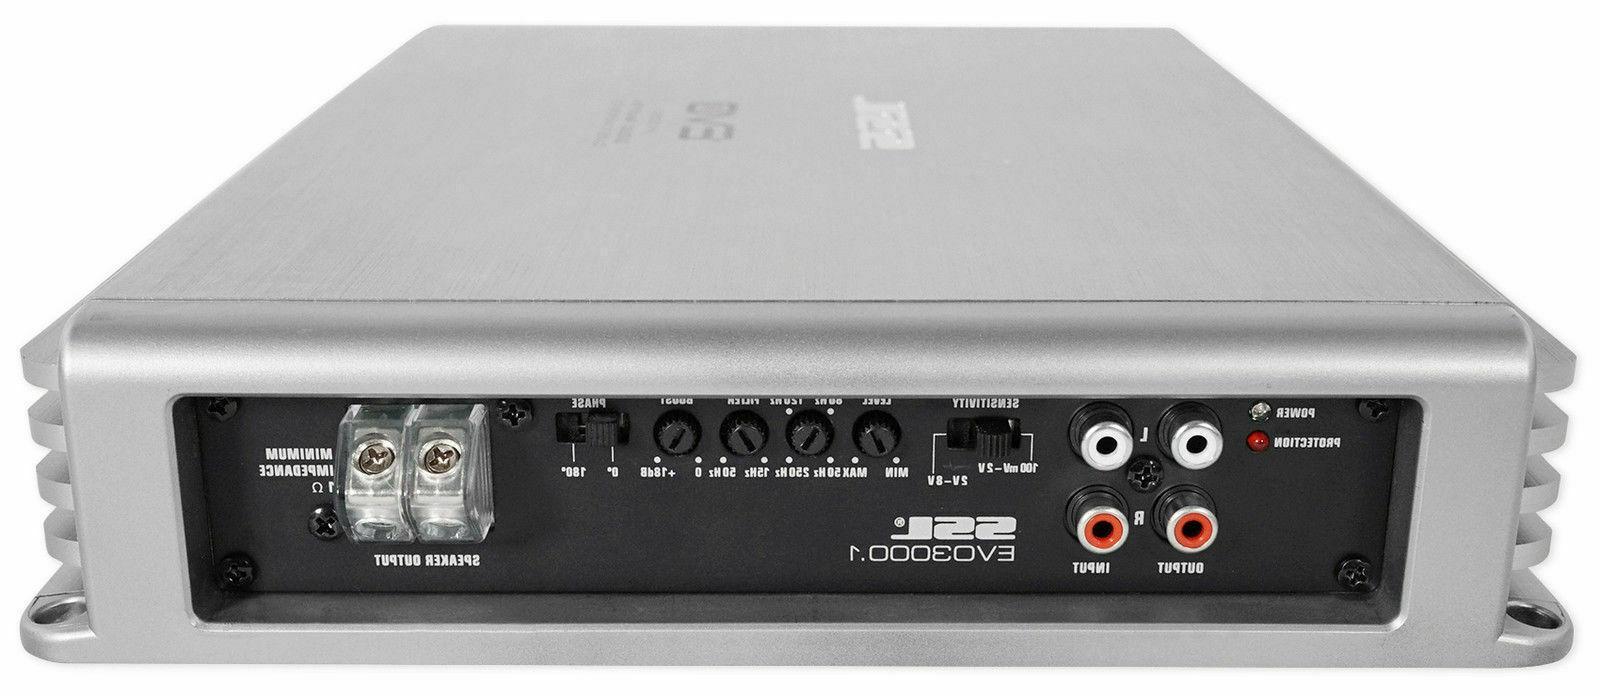 Remote Control w/ Full Touchscreen- 915-000256